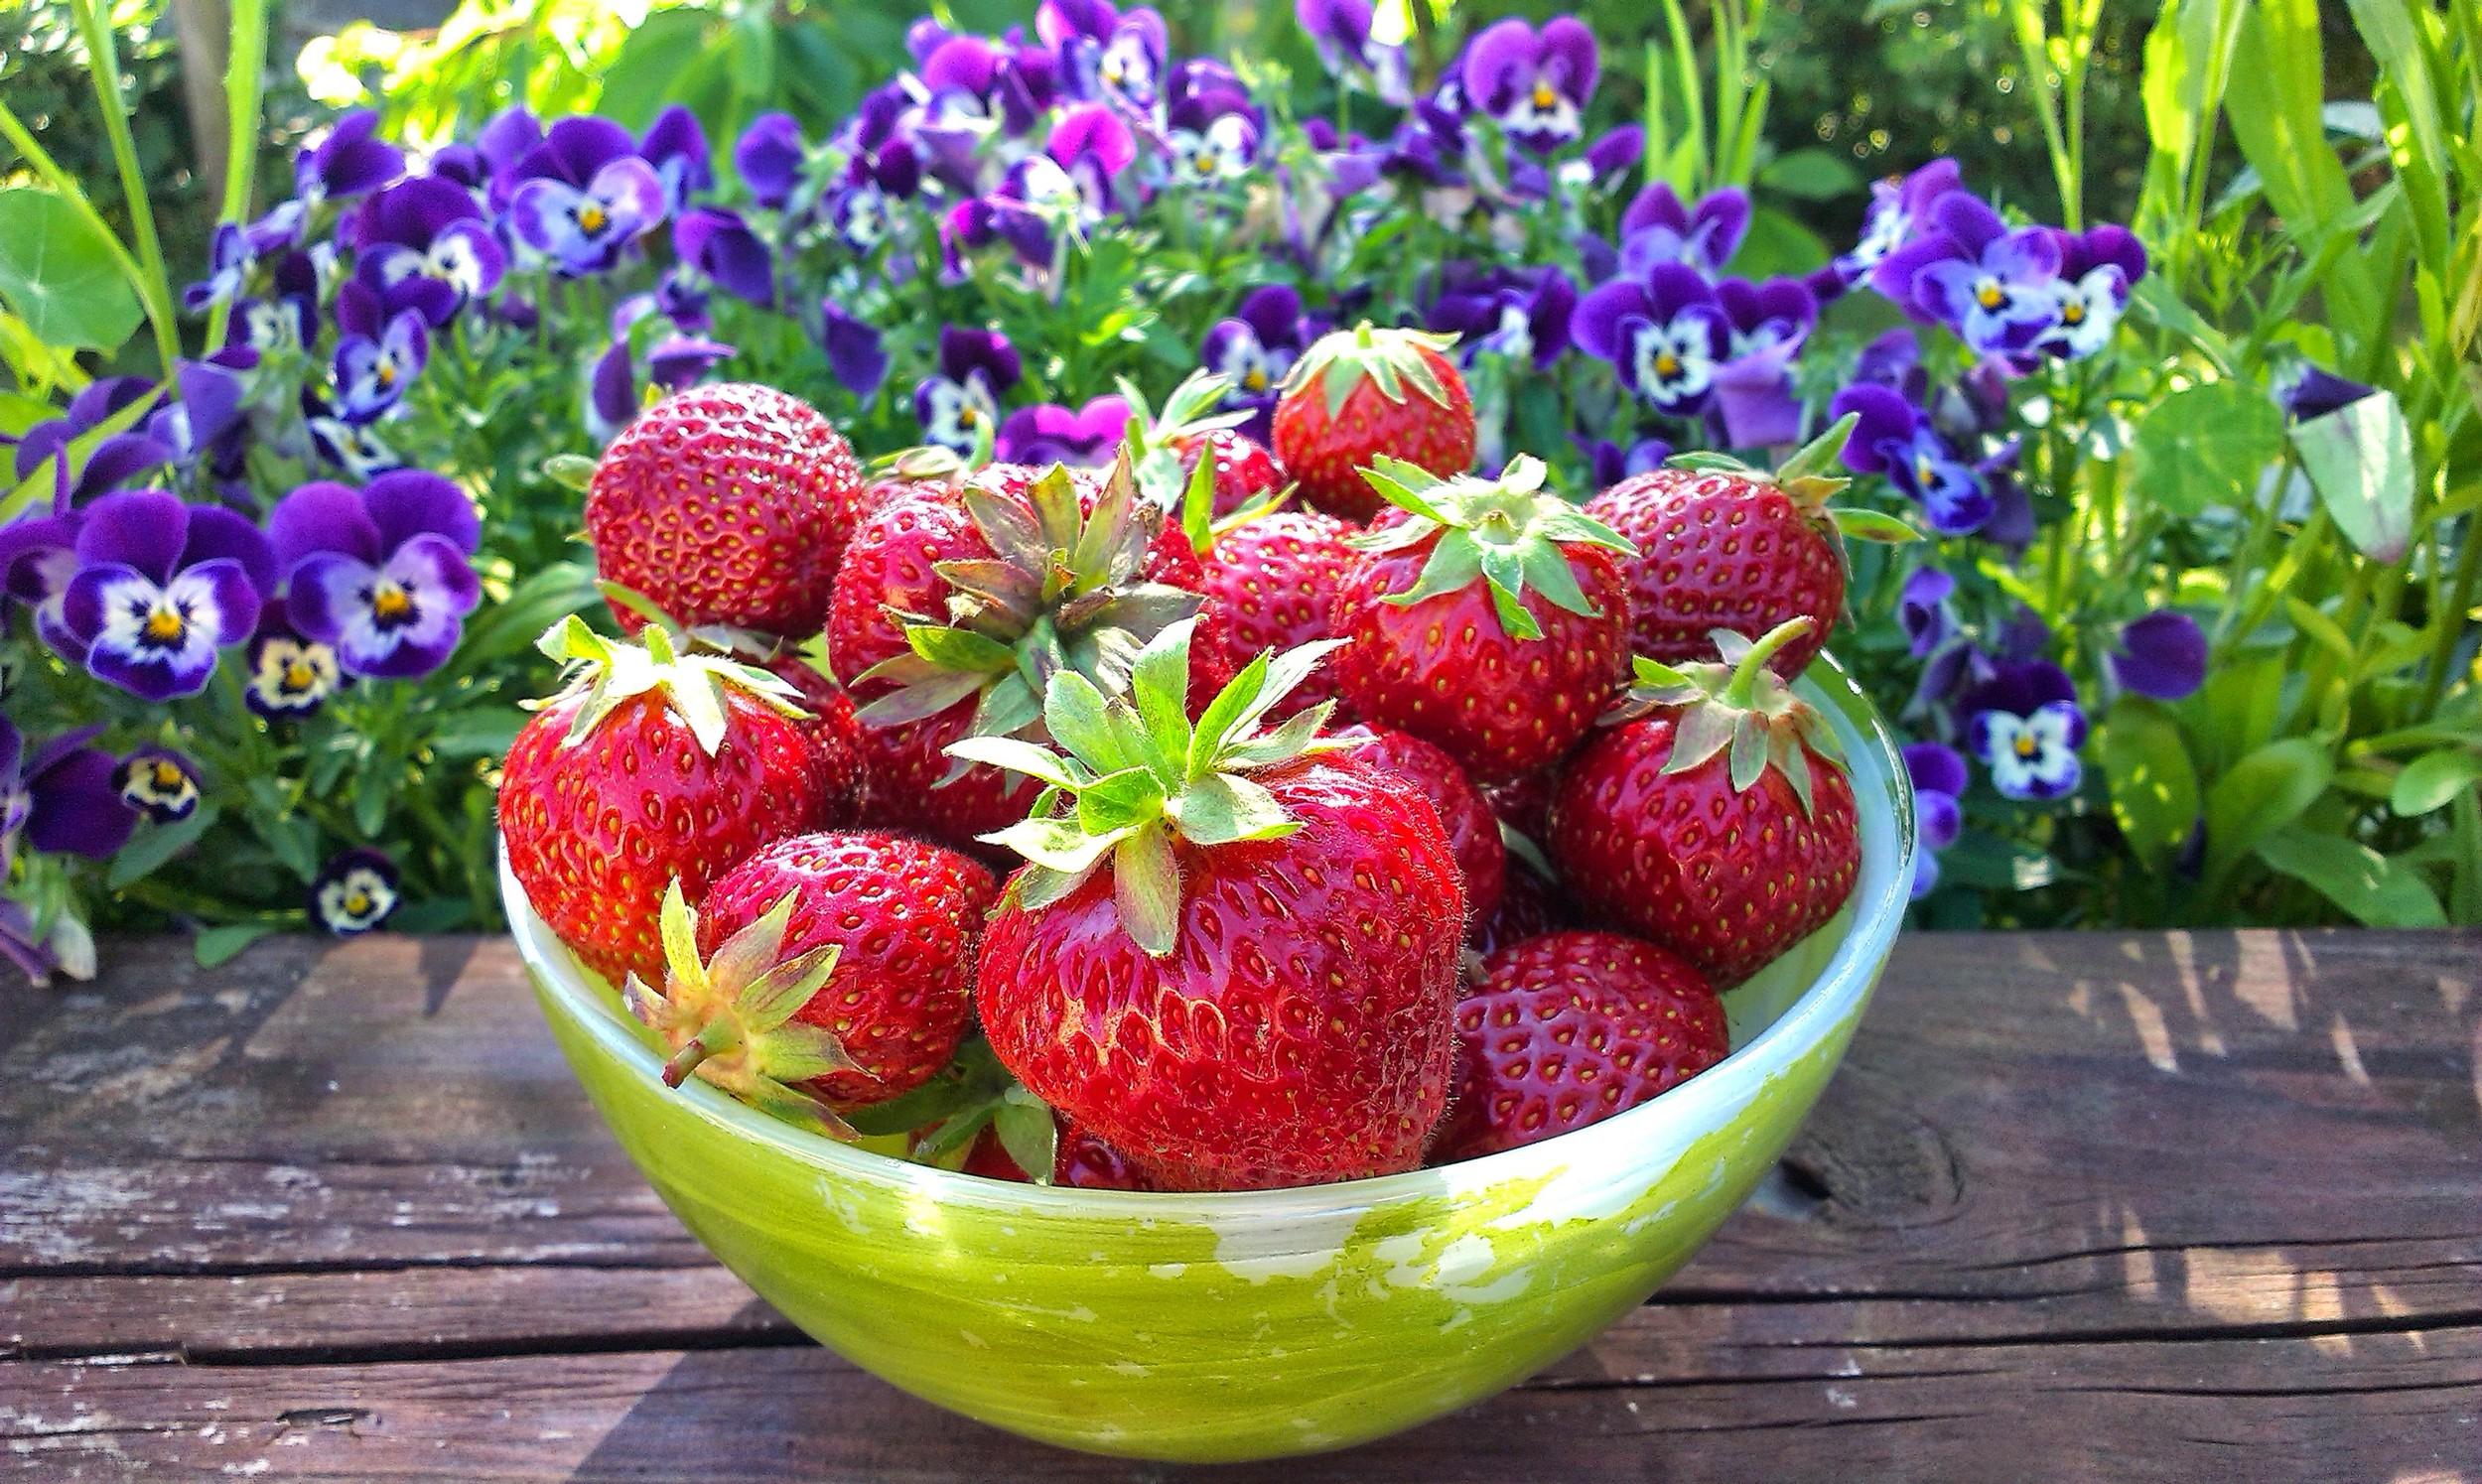 Årets første jordbær!